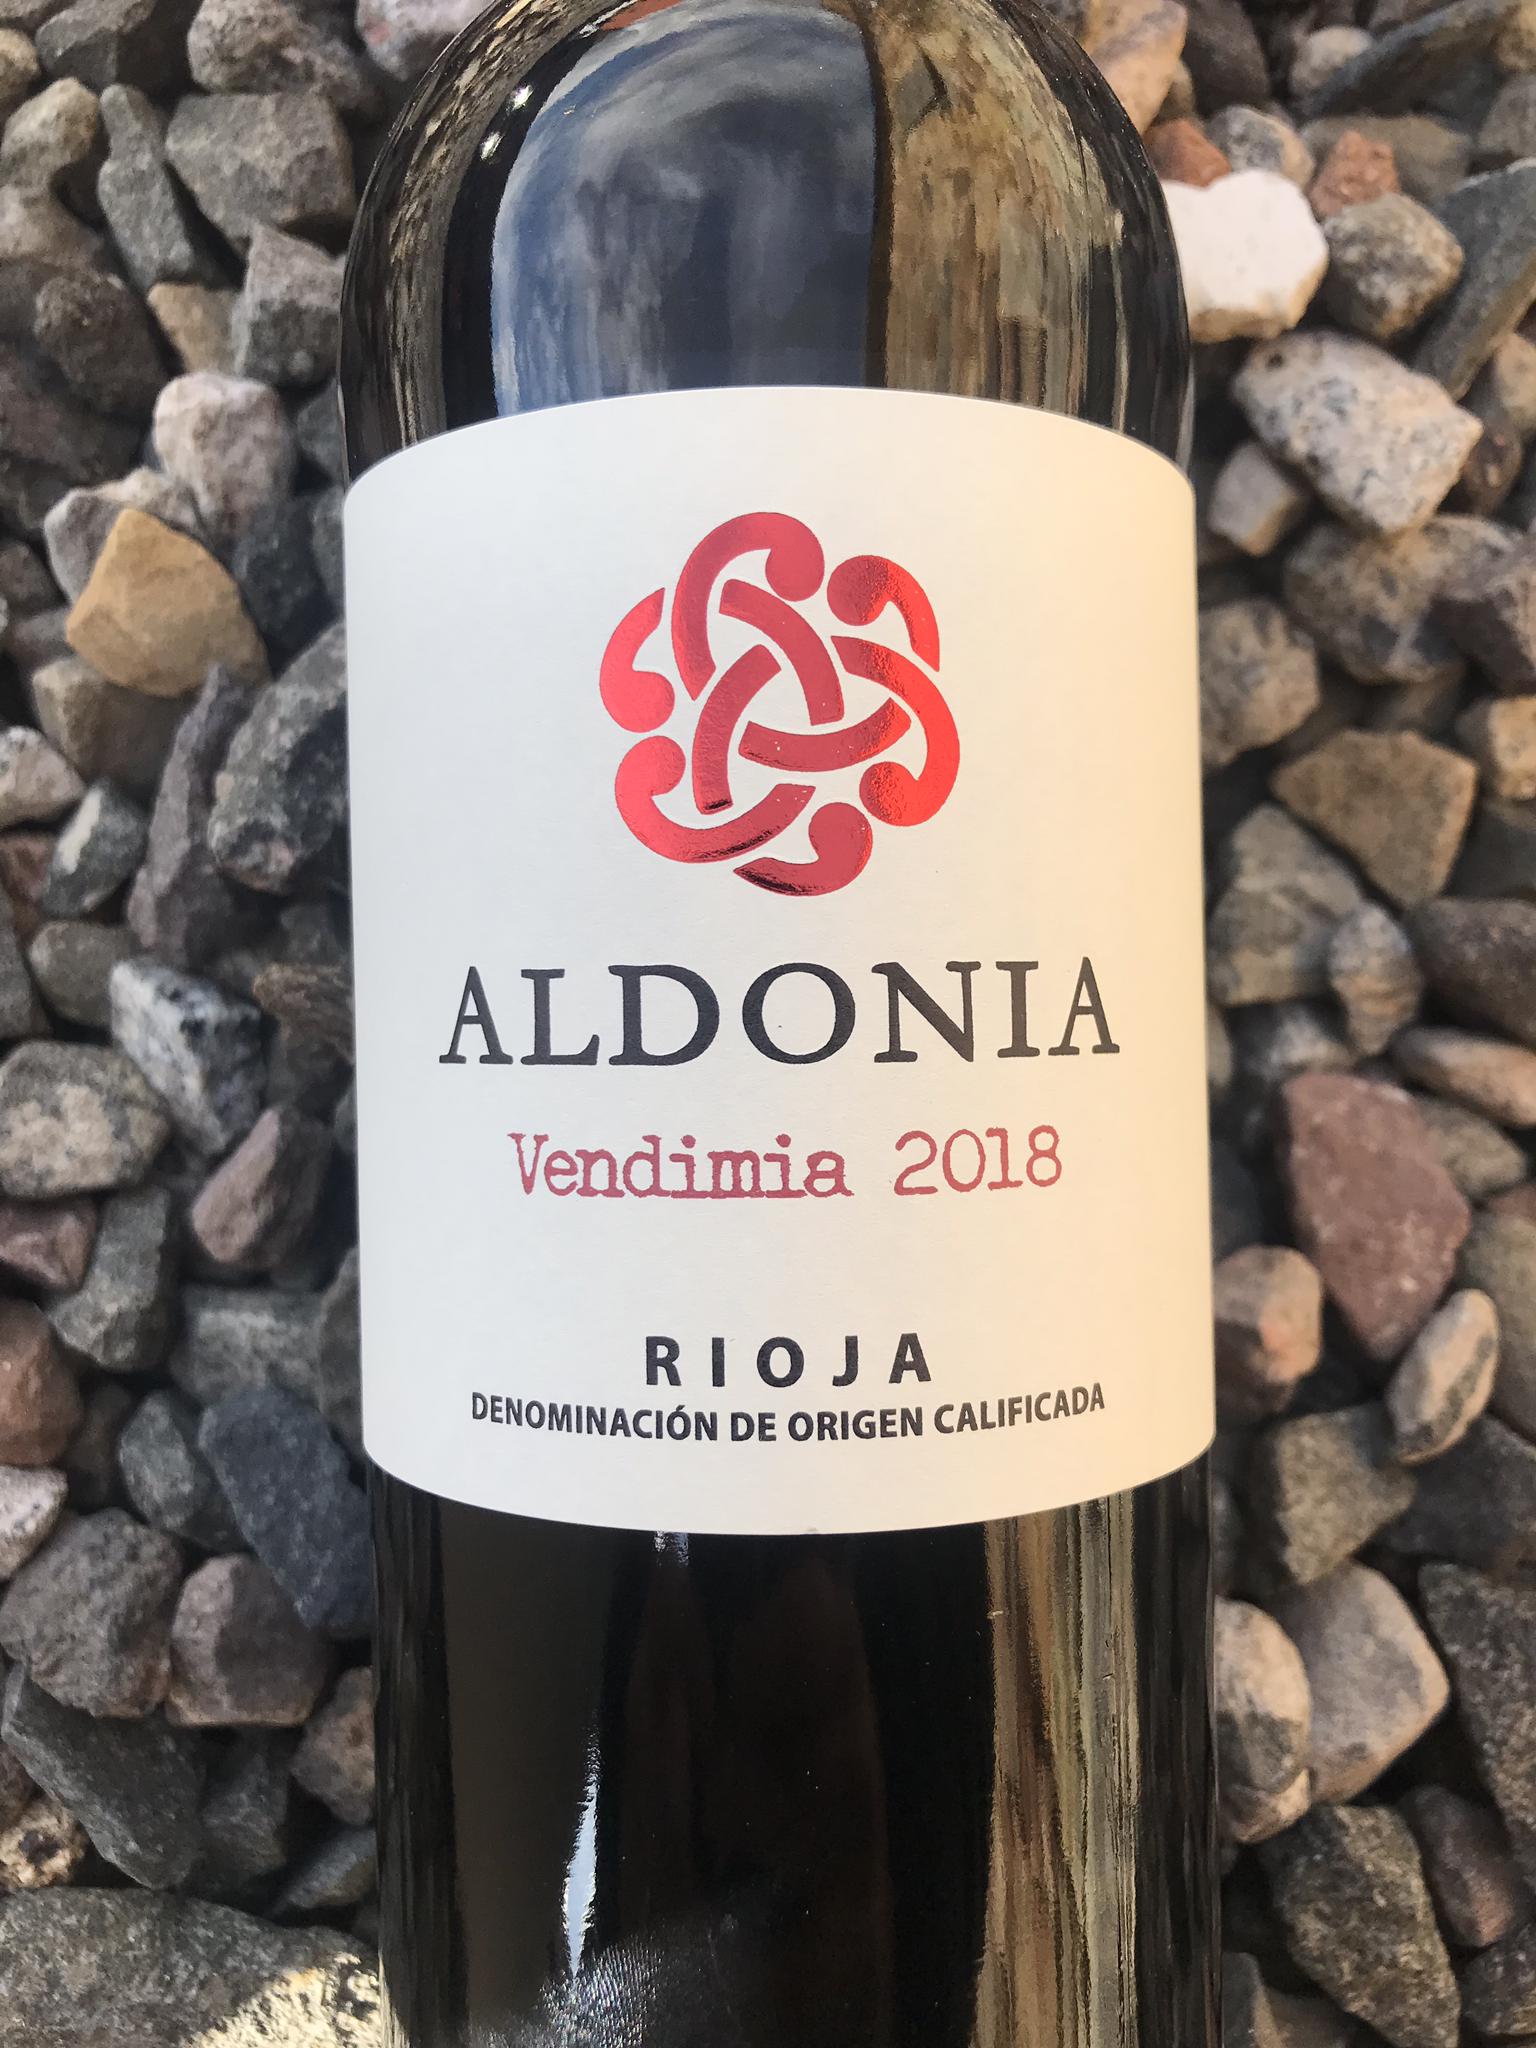 Aldonia 'Vendimia' Rioja 2018 SP1